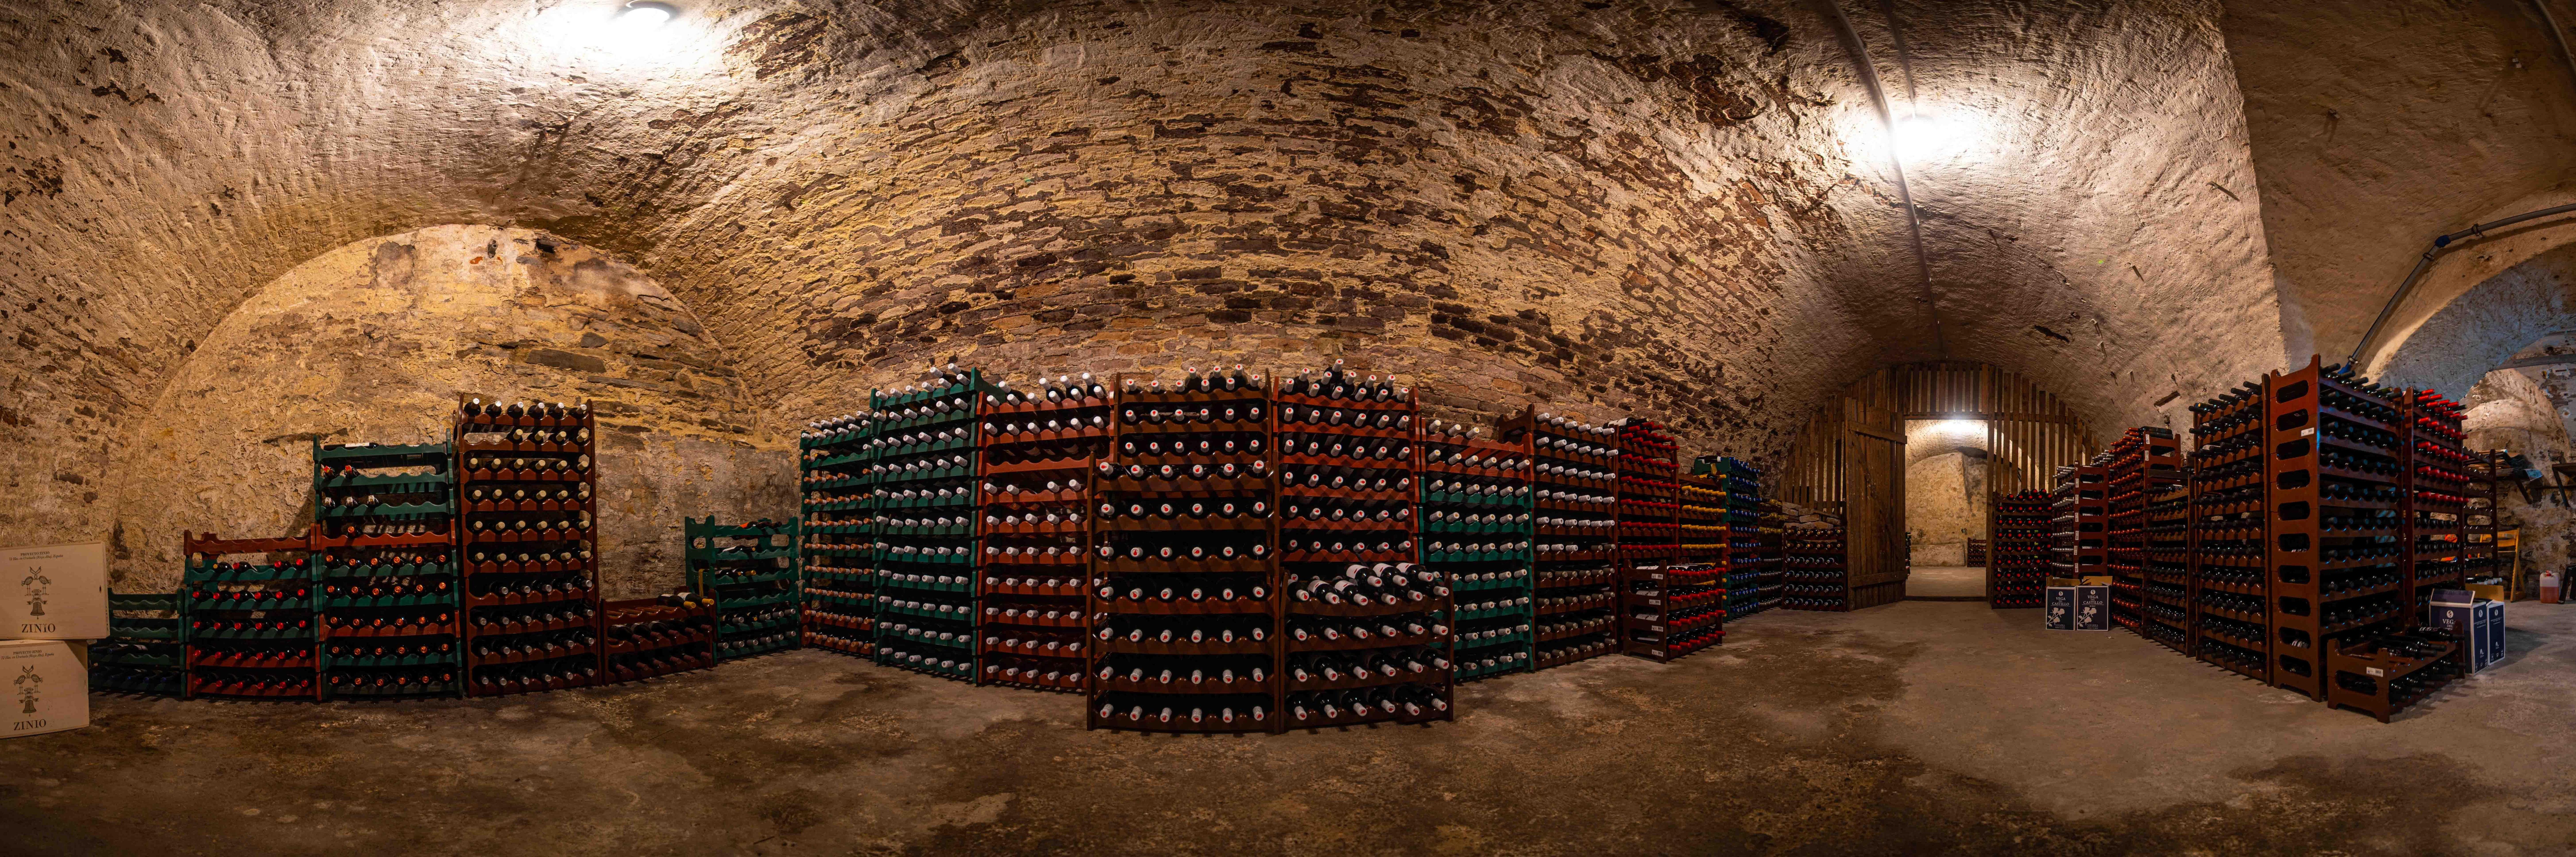 Der El Tres Weinkeller